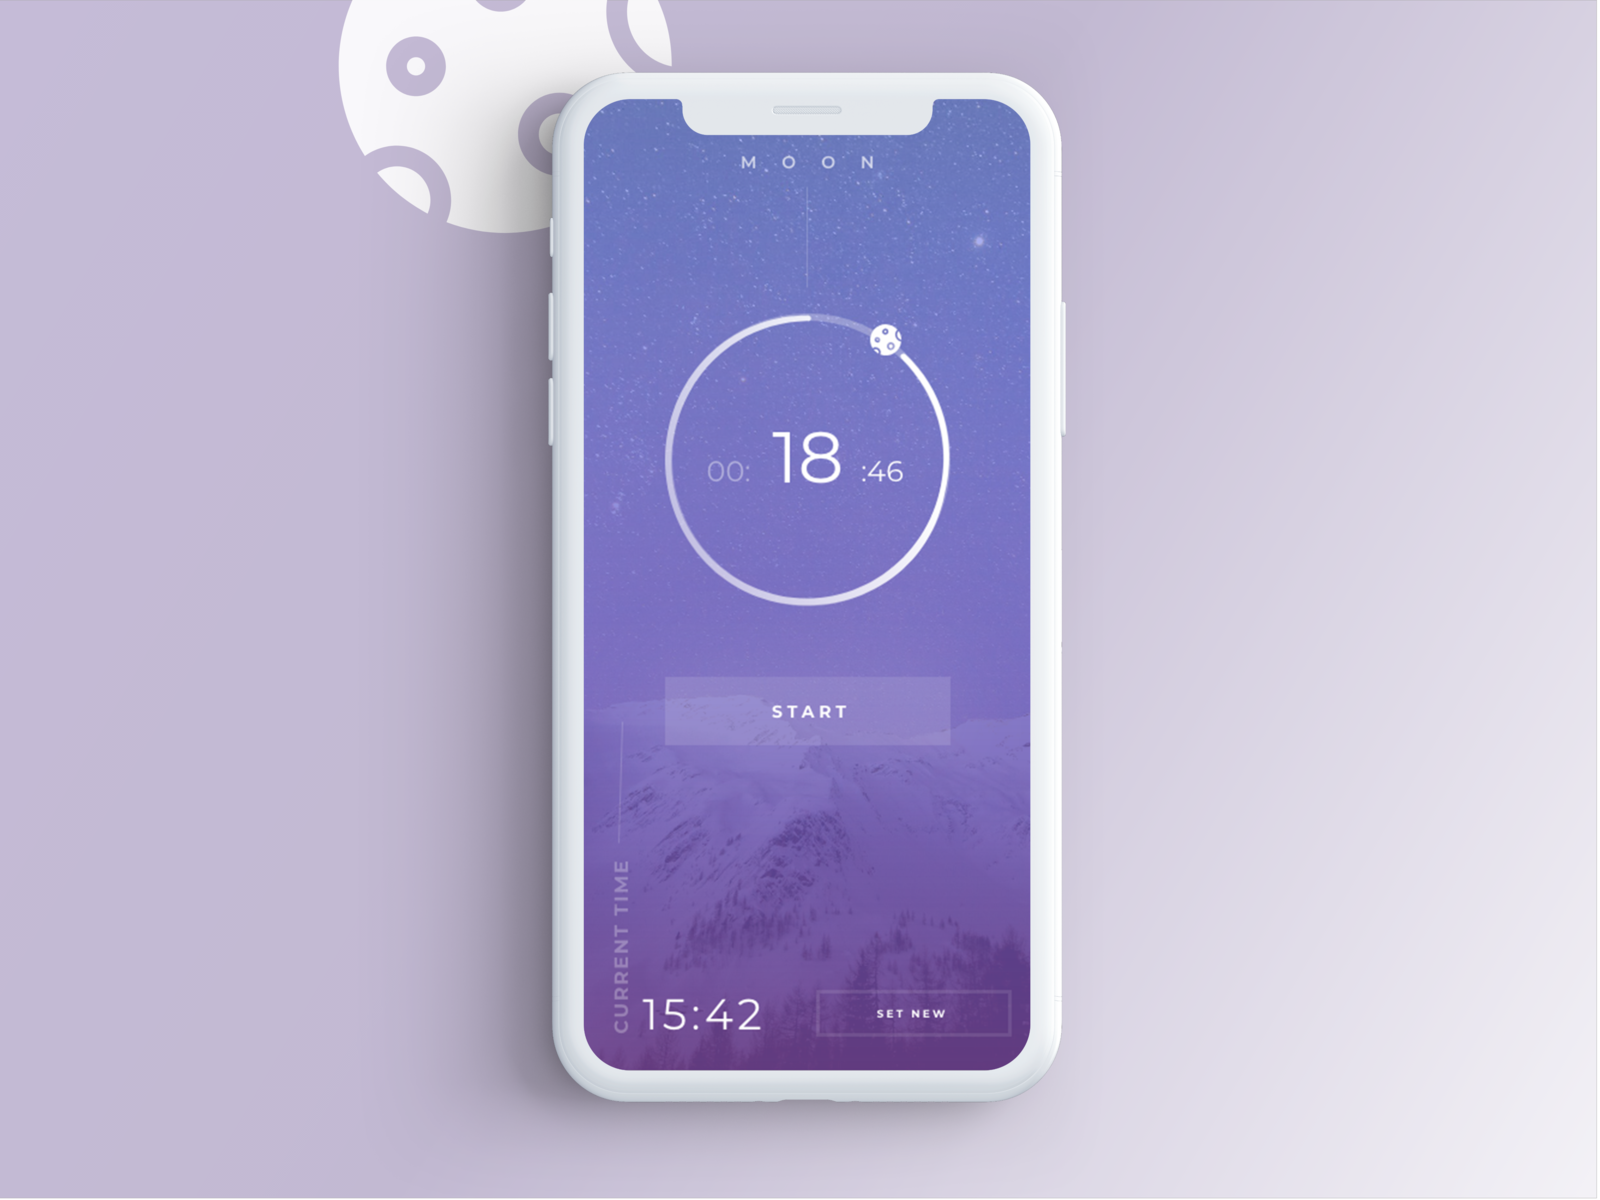 Nap app 3x 4x